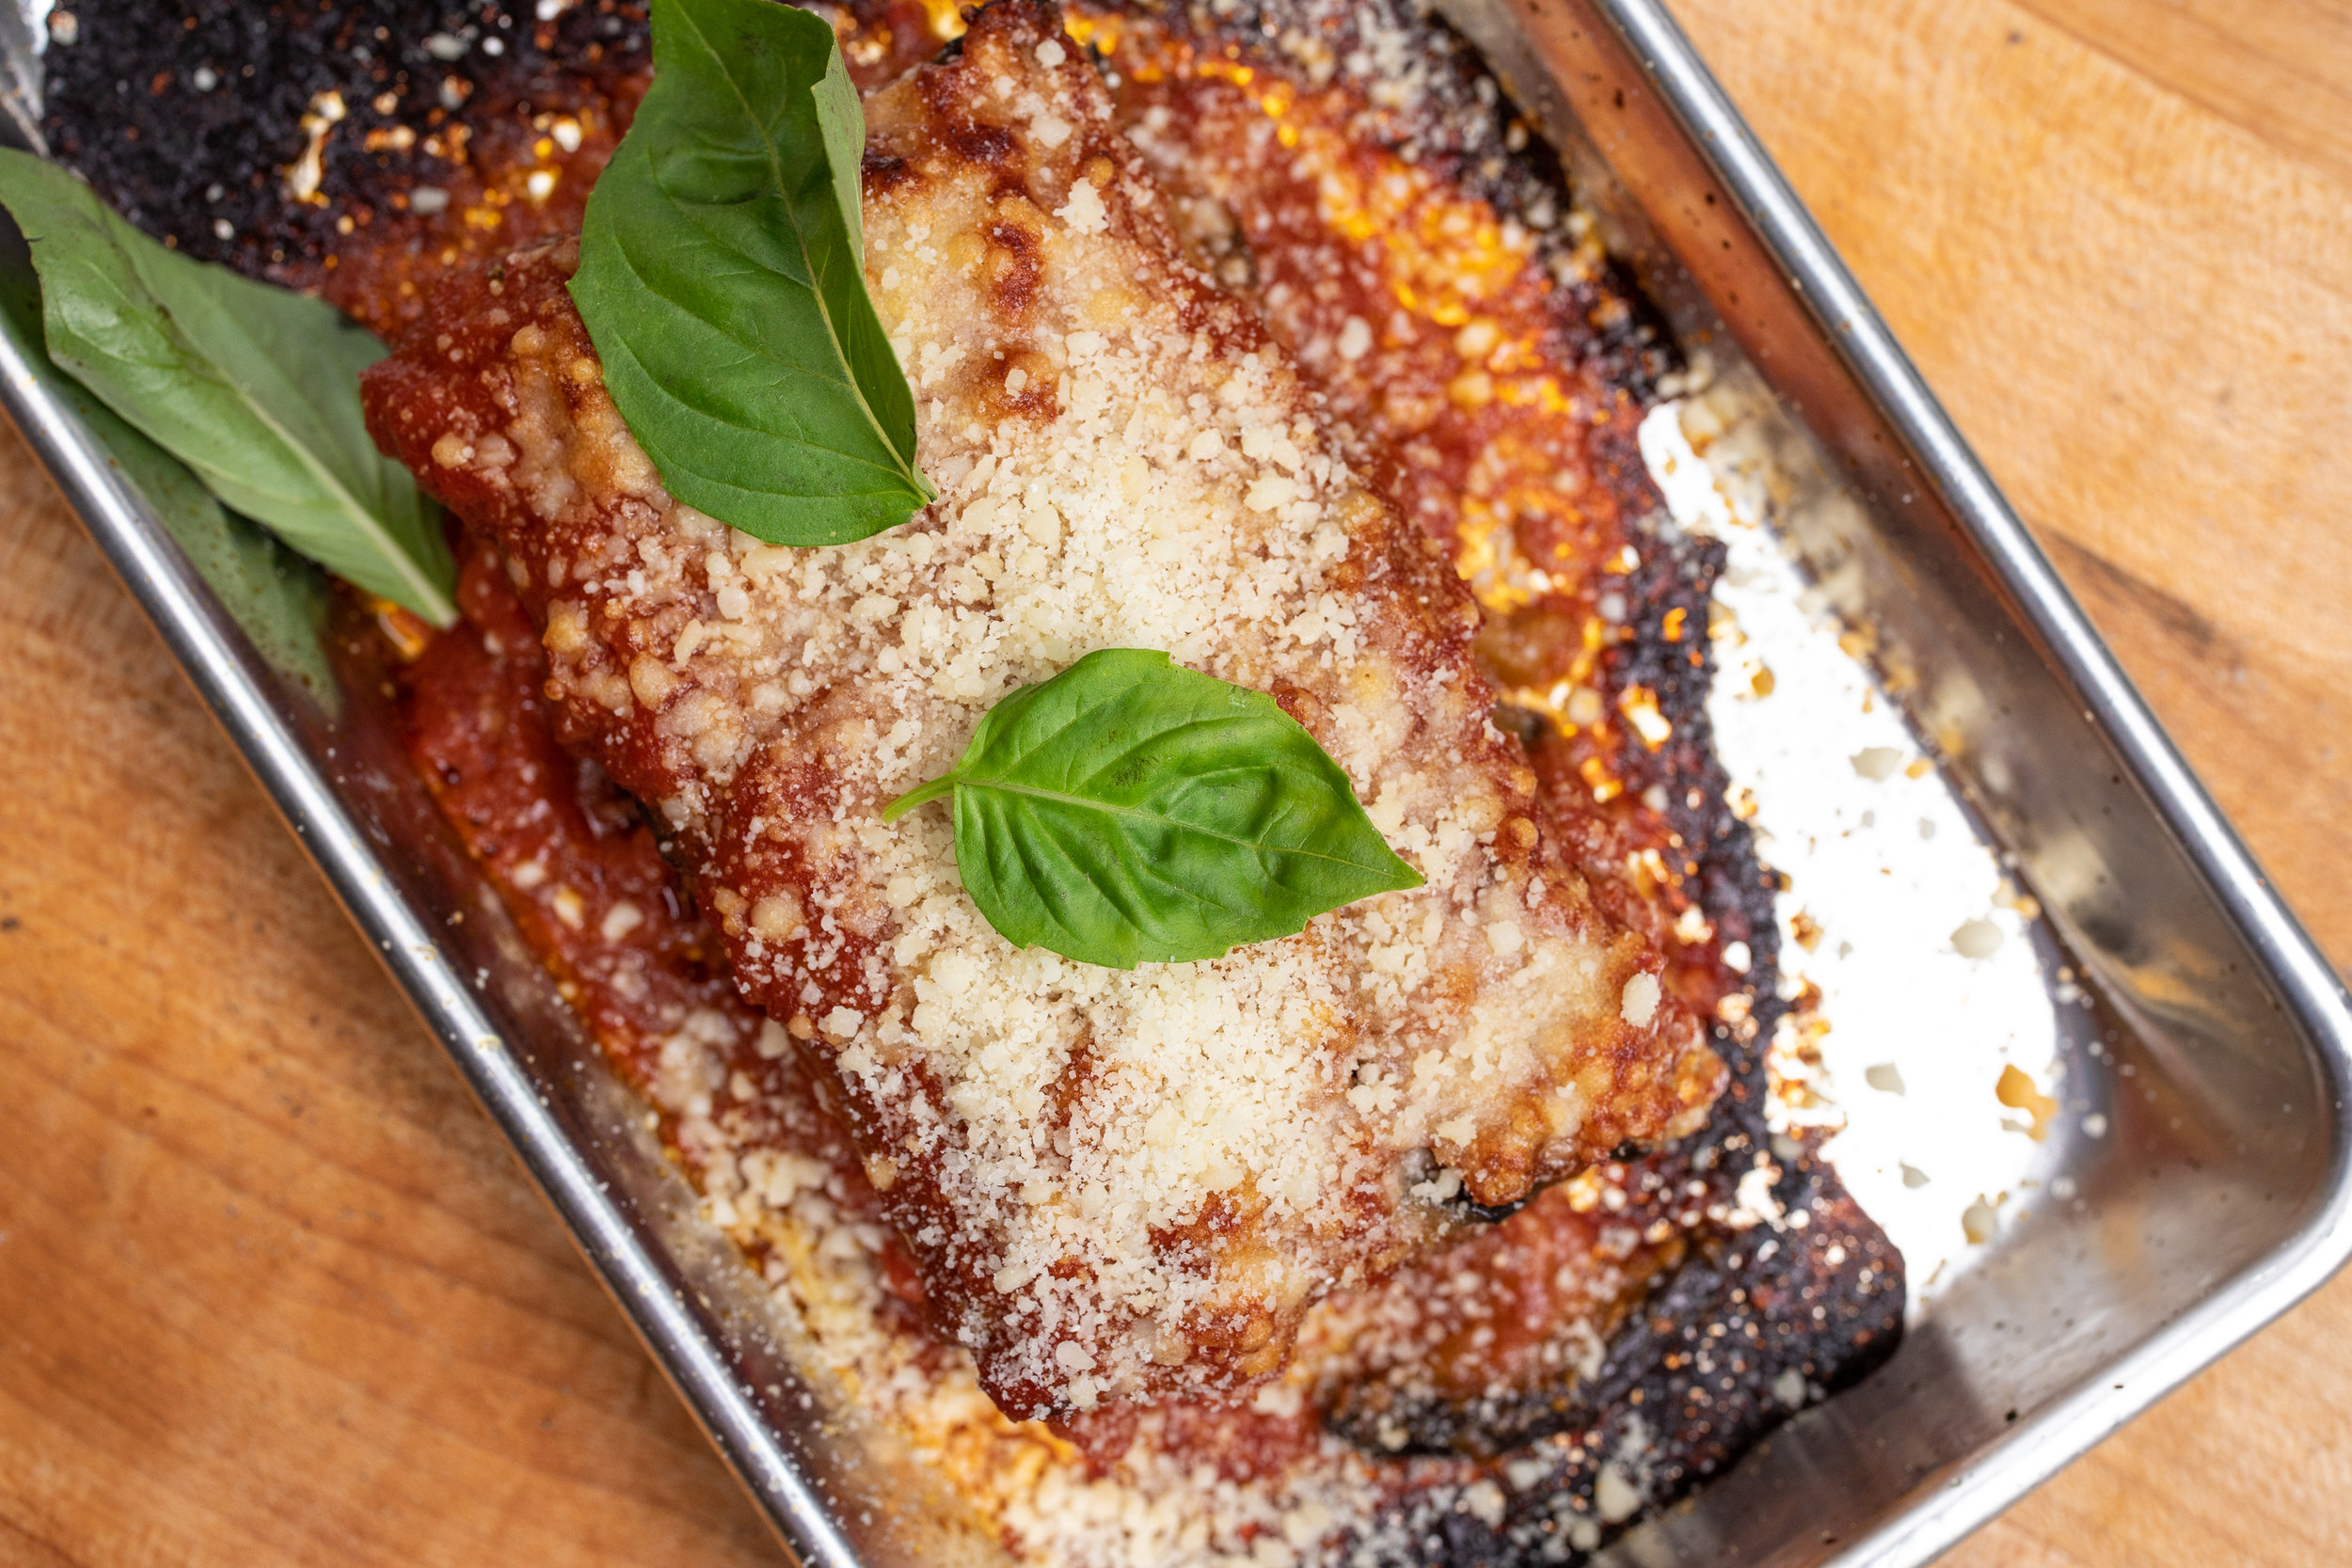 Milo SRO_Eggplant Parmesan_Photo Credit Fried Chicken Sandwich Studios.jpg